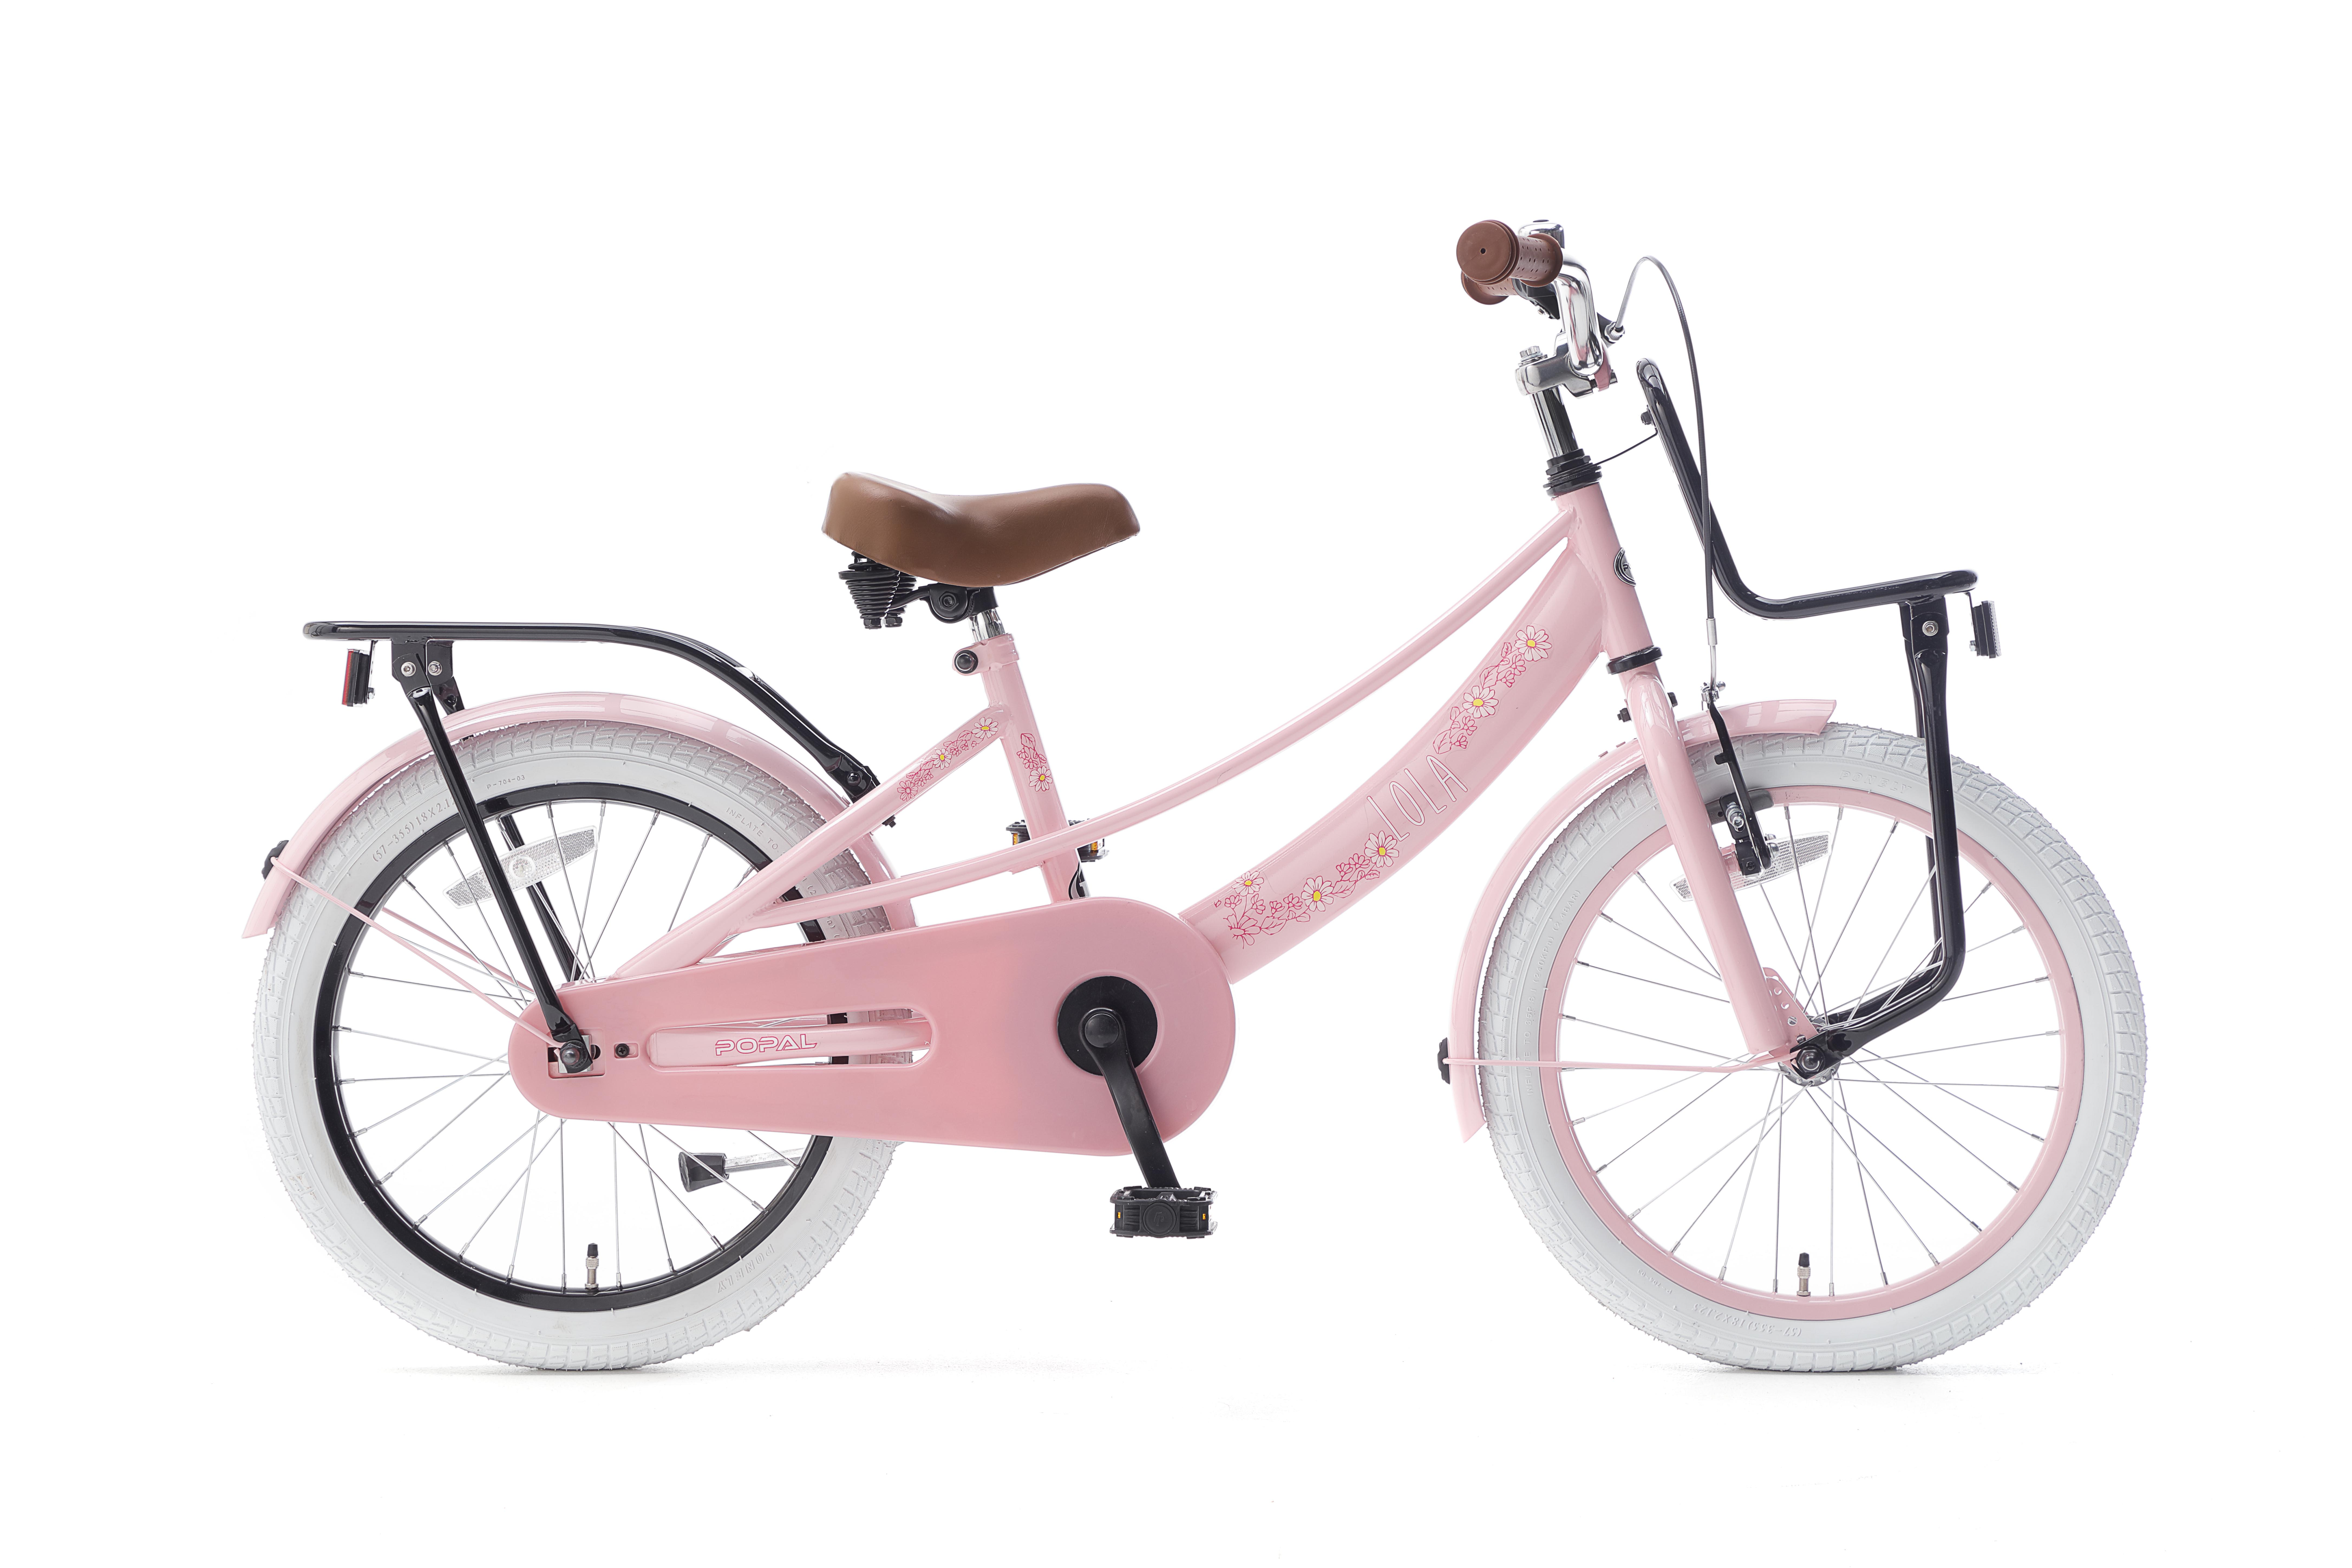 https://fietsenhalsteenwijk.files.wordpress.com/2019/06/lola-rose.jpg